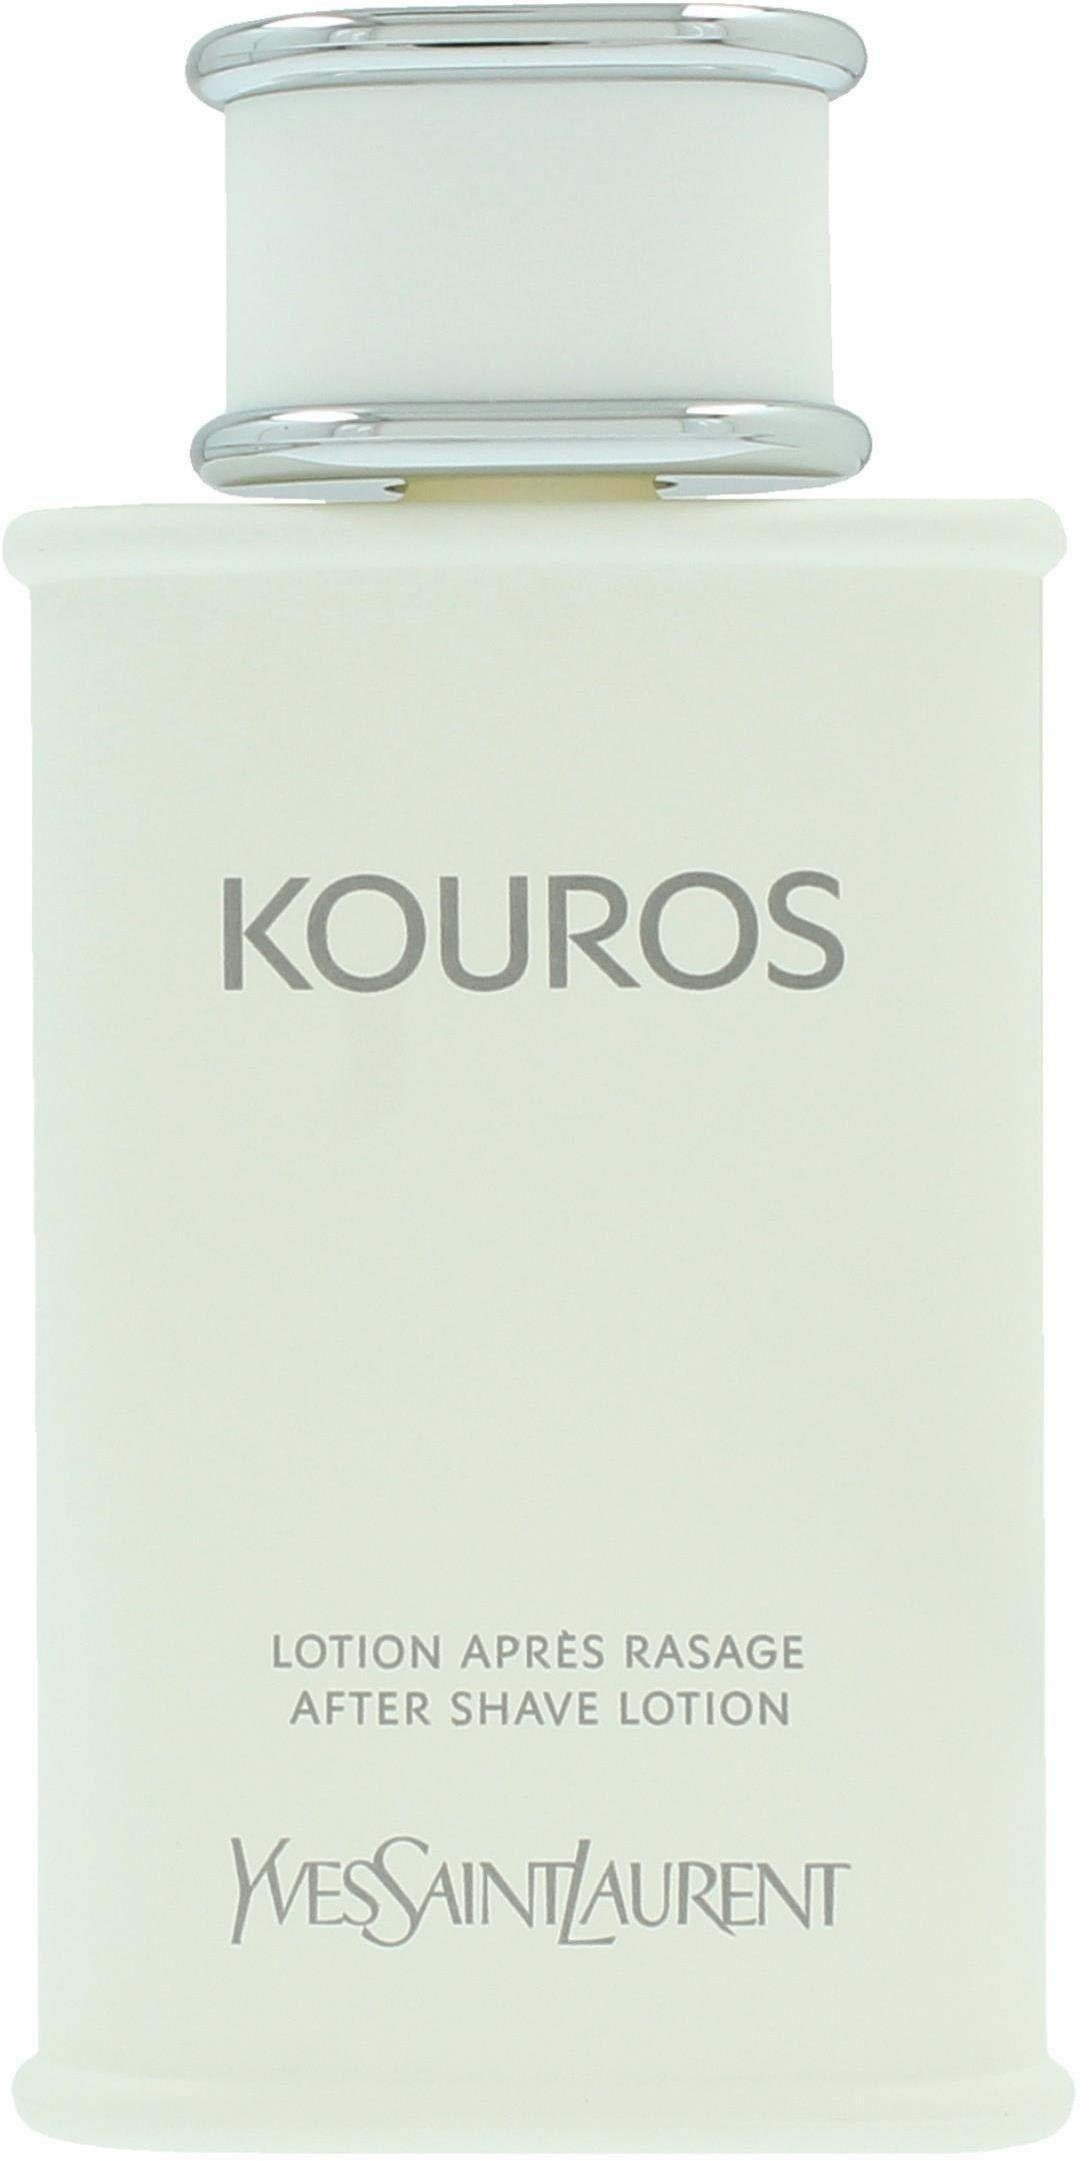 Yves Saint Laurent, »Kouros«, Aftershave